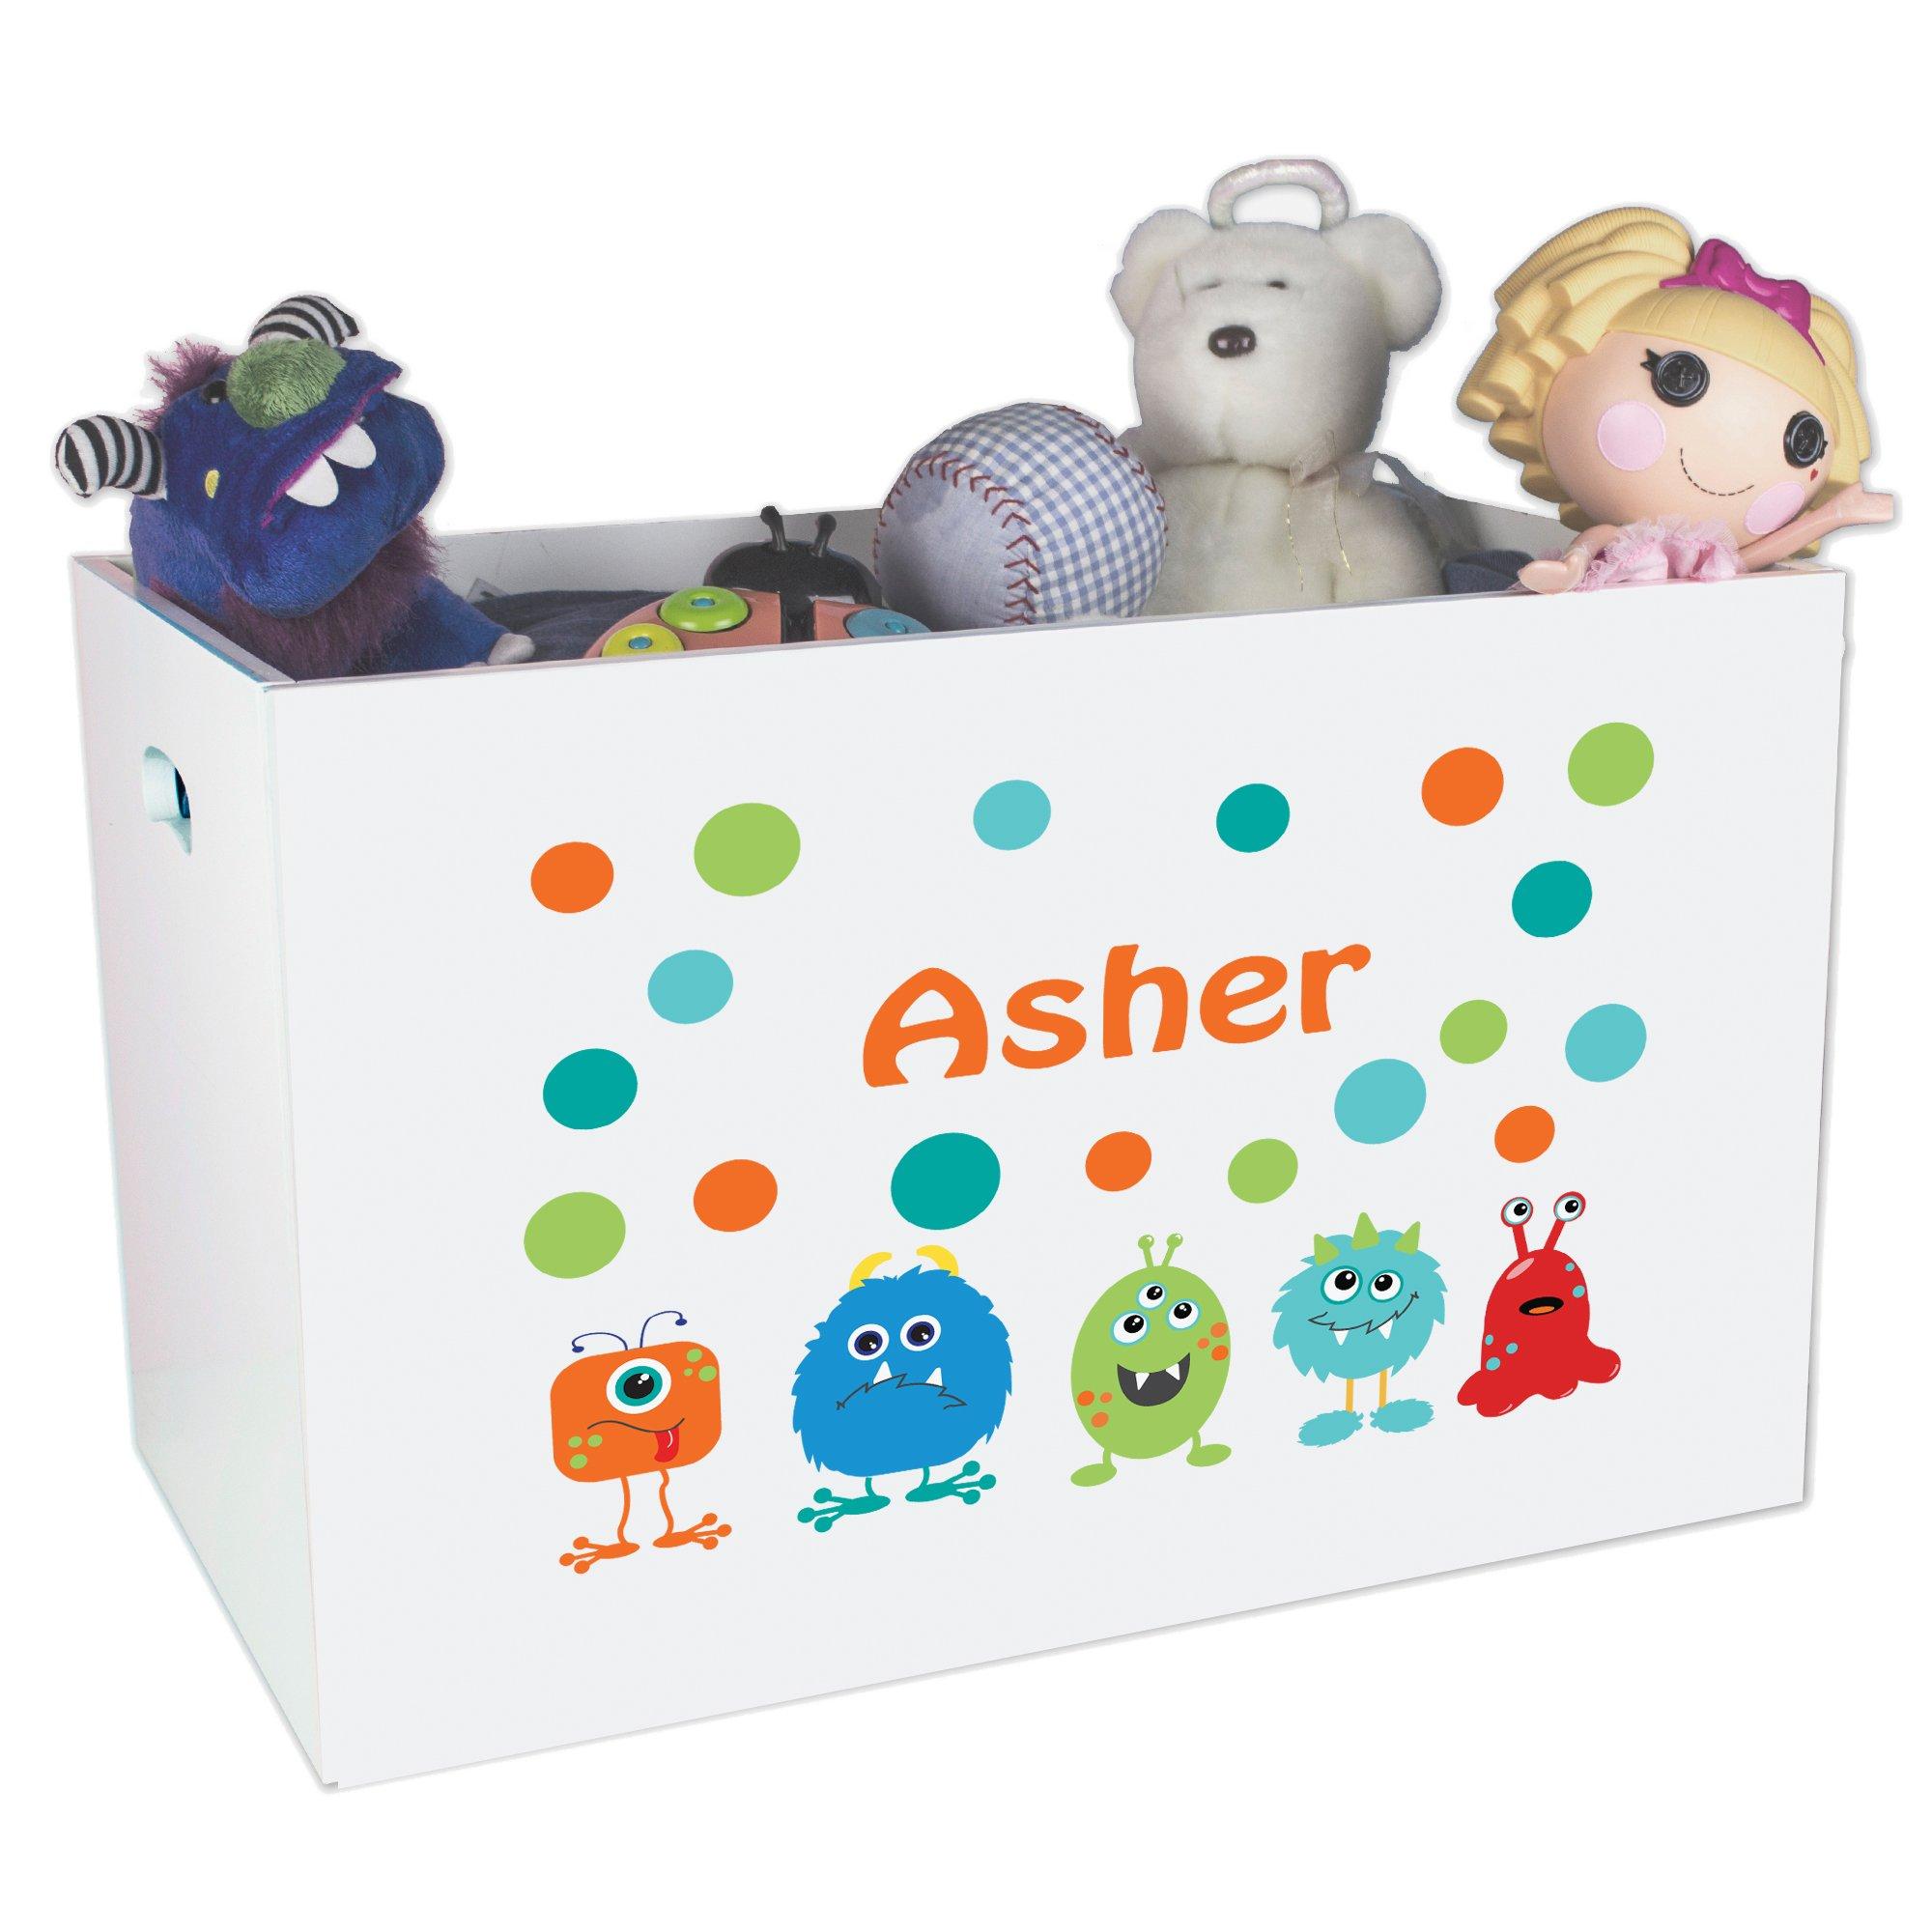 Personalized Mash Childrens Nursery White Open Toy Box